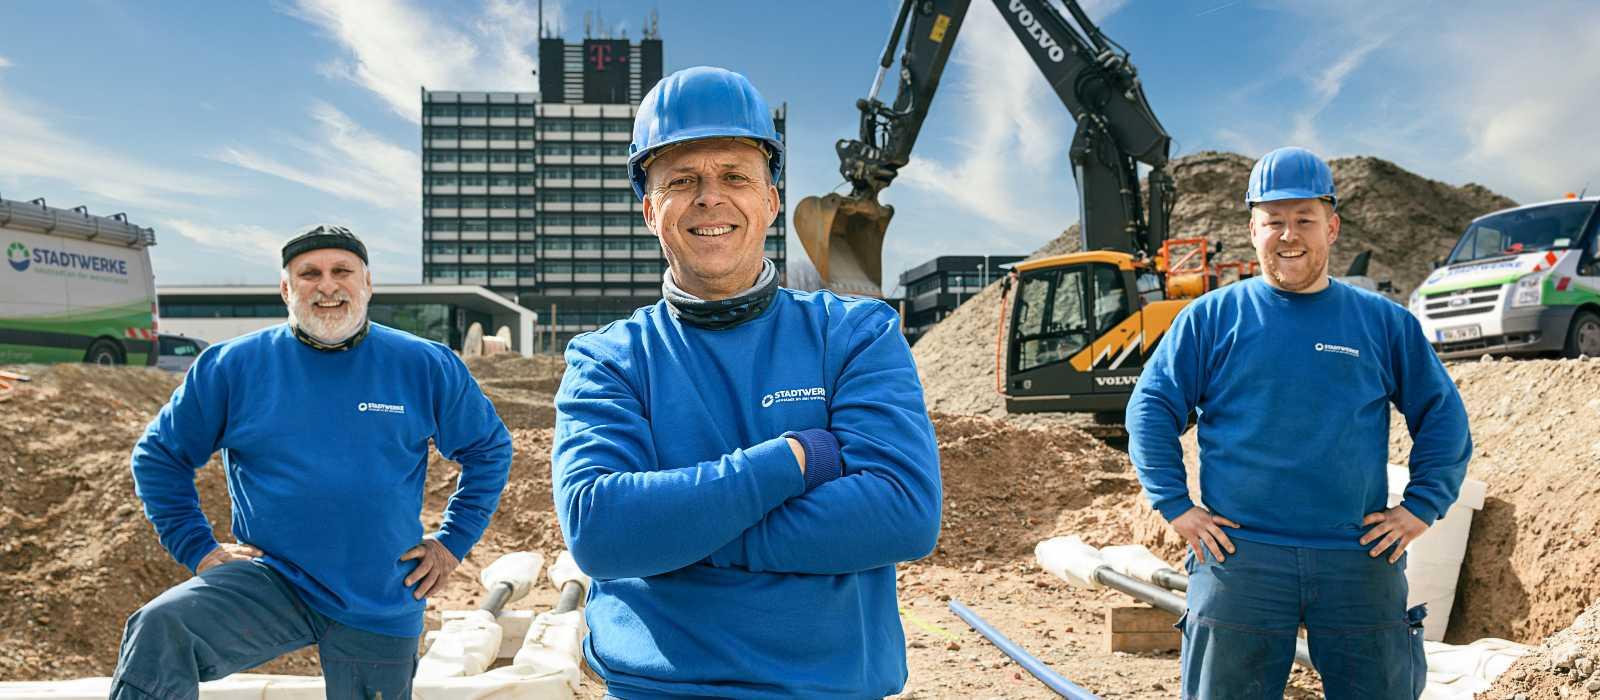 Stadtwerke Neustadt Service Bauherrenservice Kachel Installateure Arbeiter© AD LUMINA Ralf Ziegler